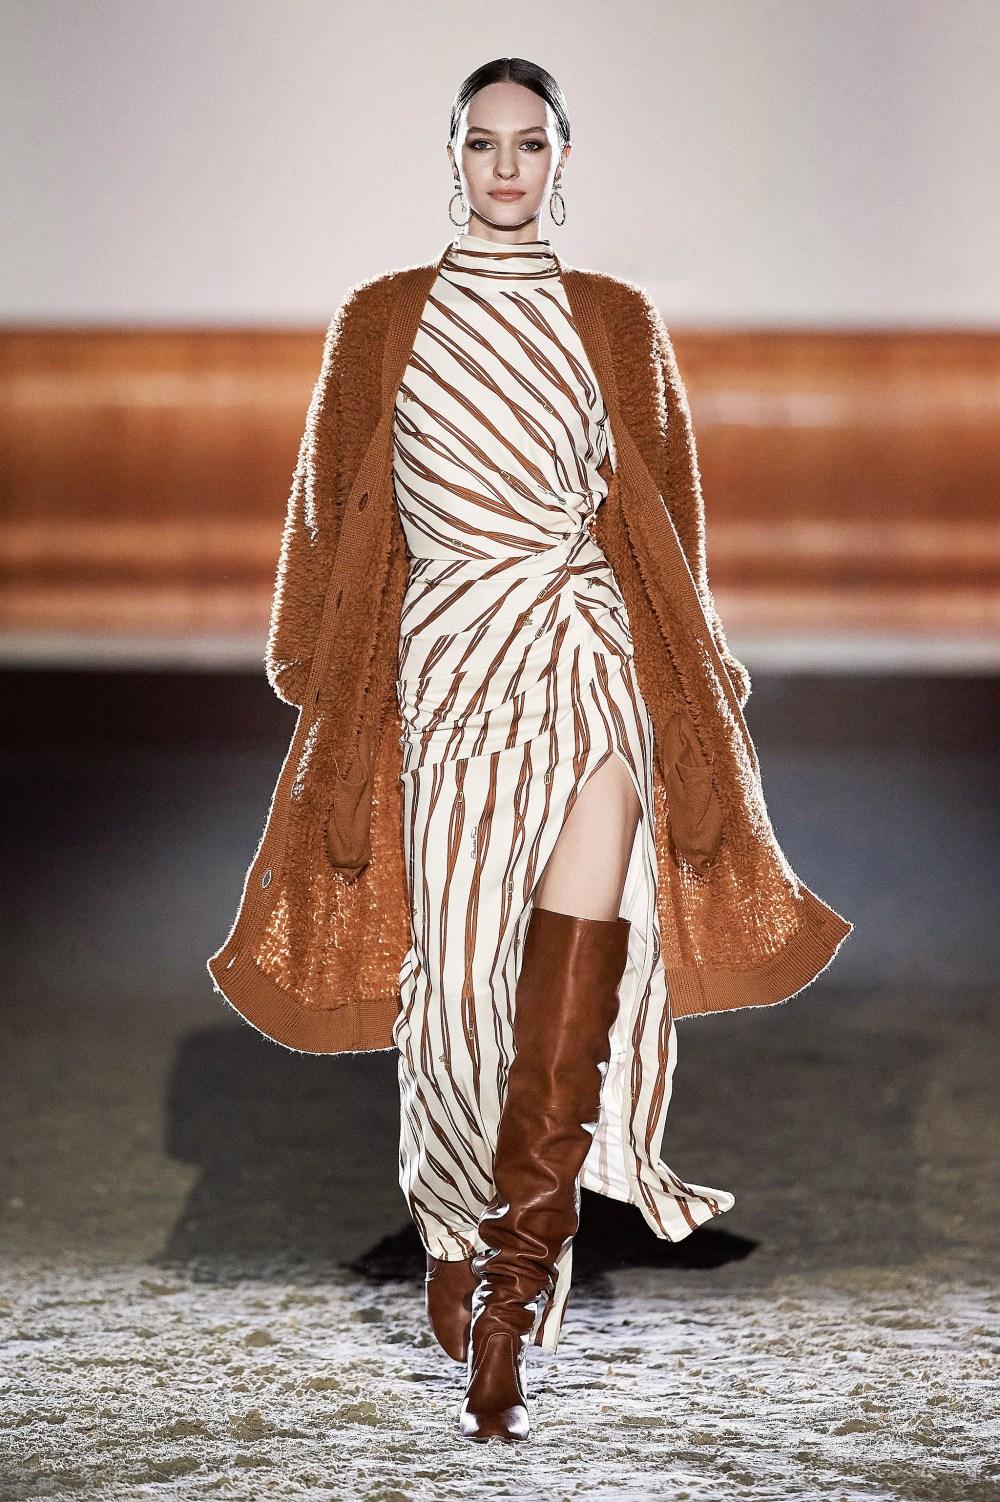 Elisabetta Franchi: Elisabetta Franchi Fall Winter 2021-22 Fashion Show Photo #20